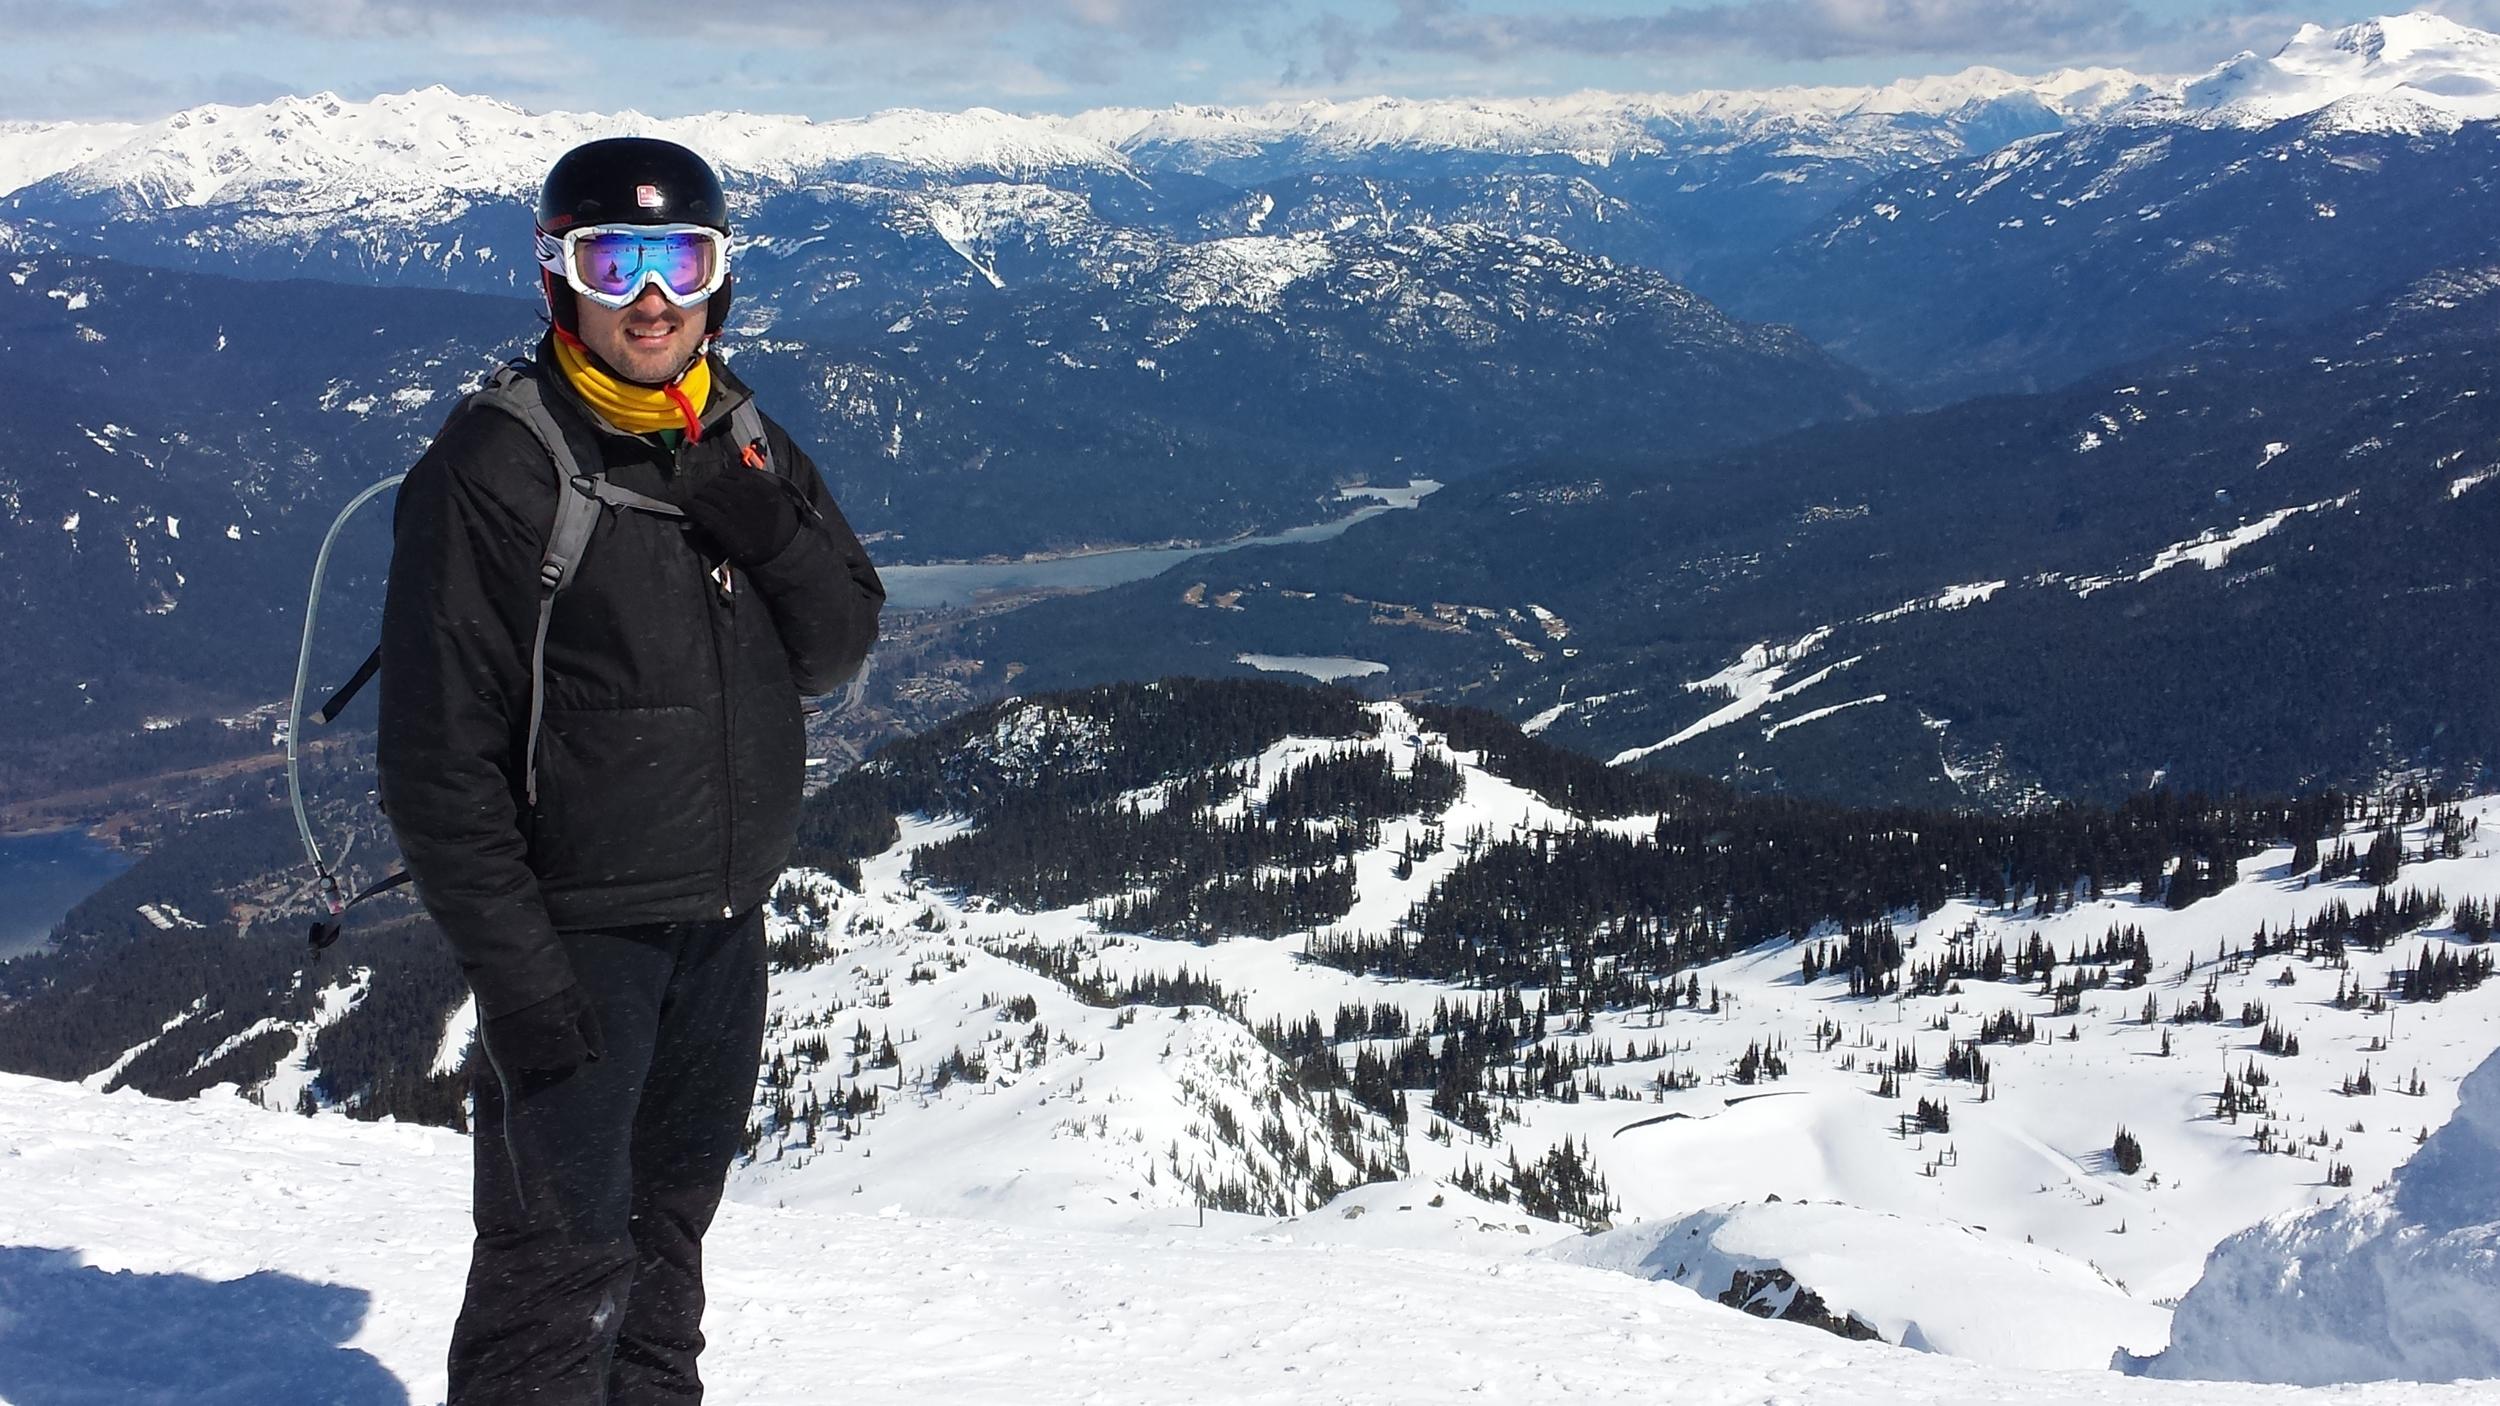 Peak Lookout - Whistler, BC